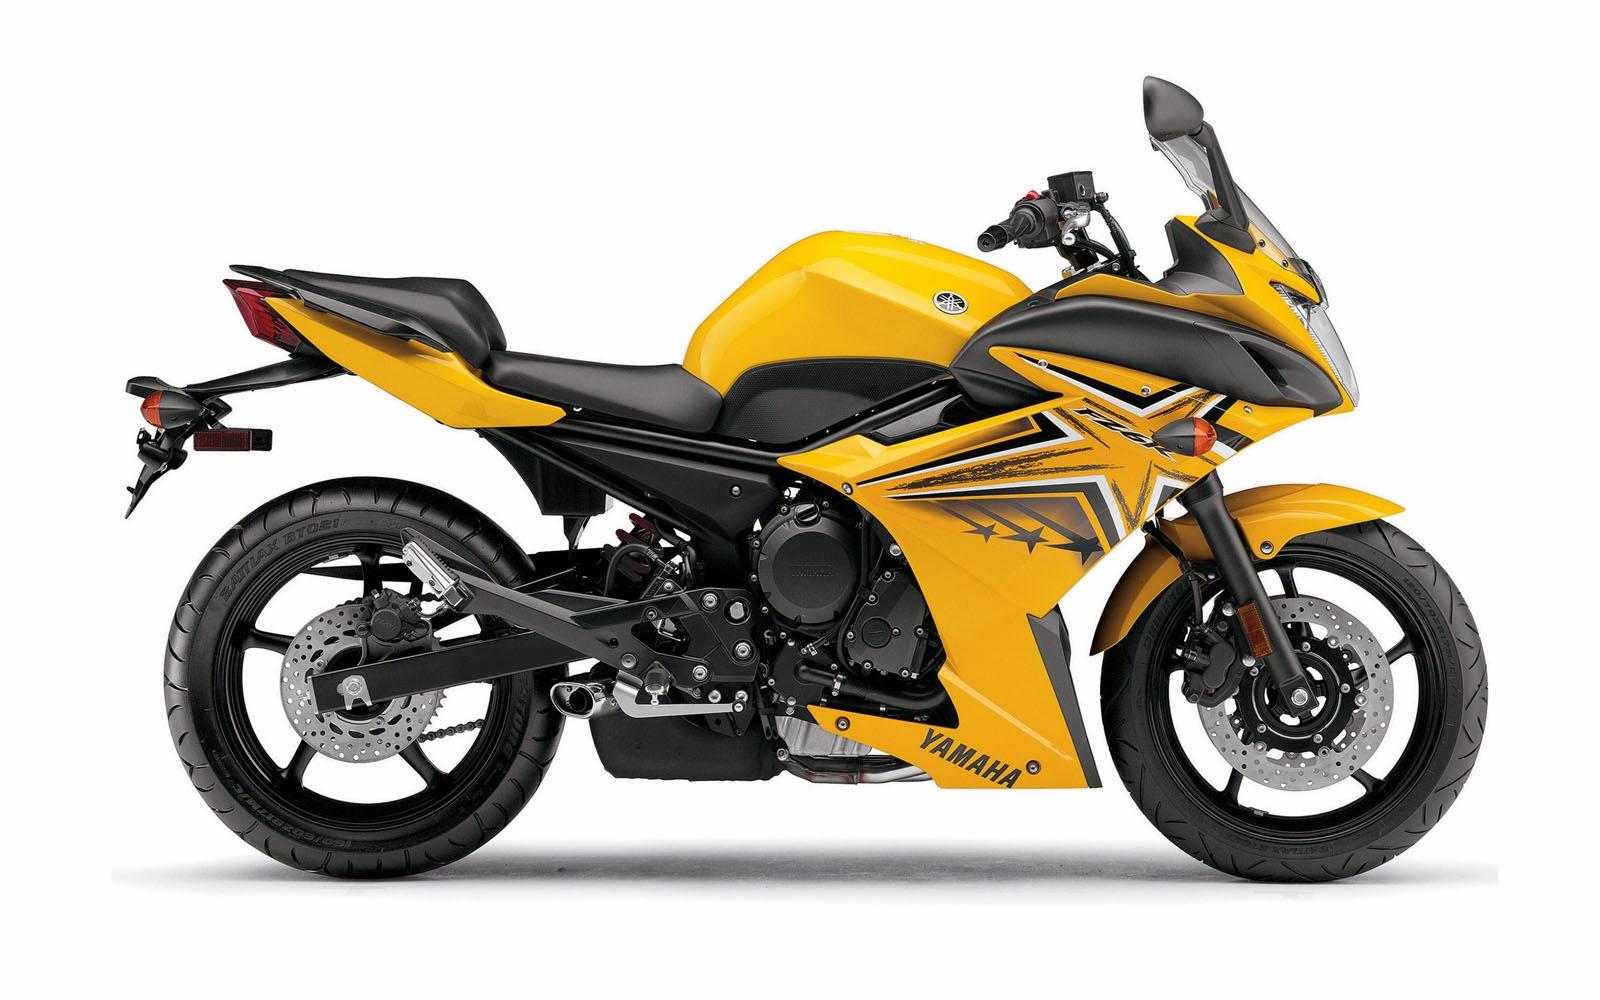 Wallpaper Yamaha Fz 10 Sportbikes 2017 Bikes Yamaha Hd: Yamaha FZ6R Motorcycle Wallpapers